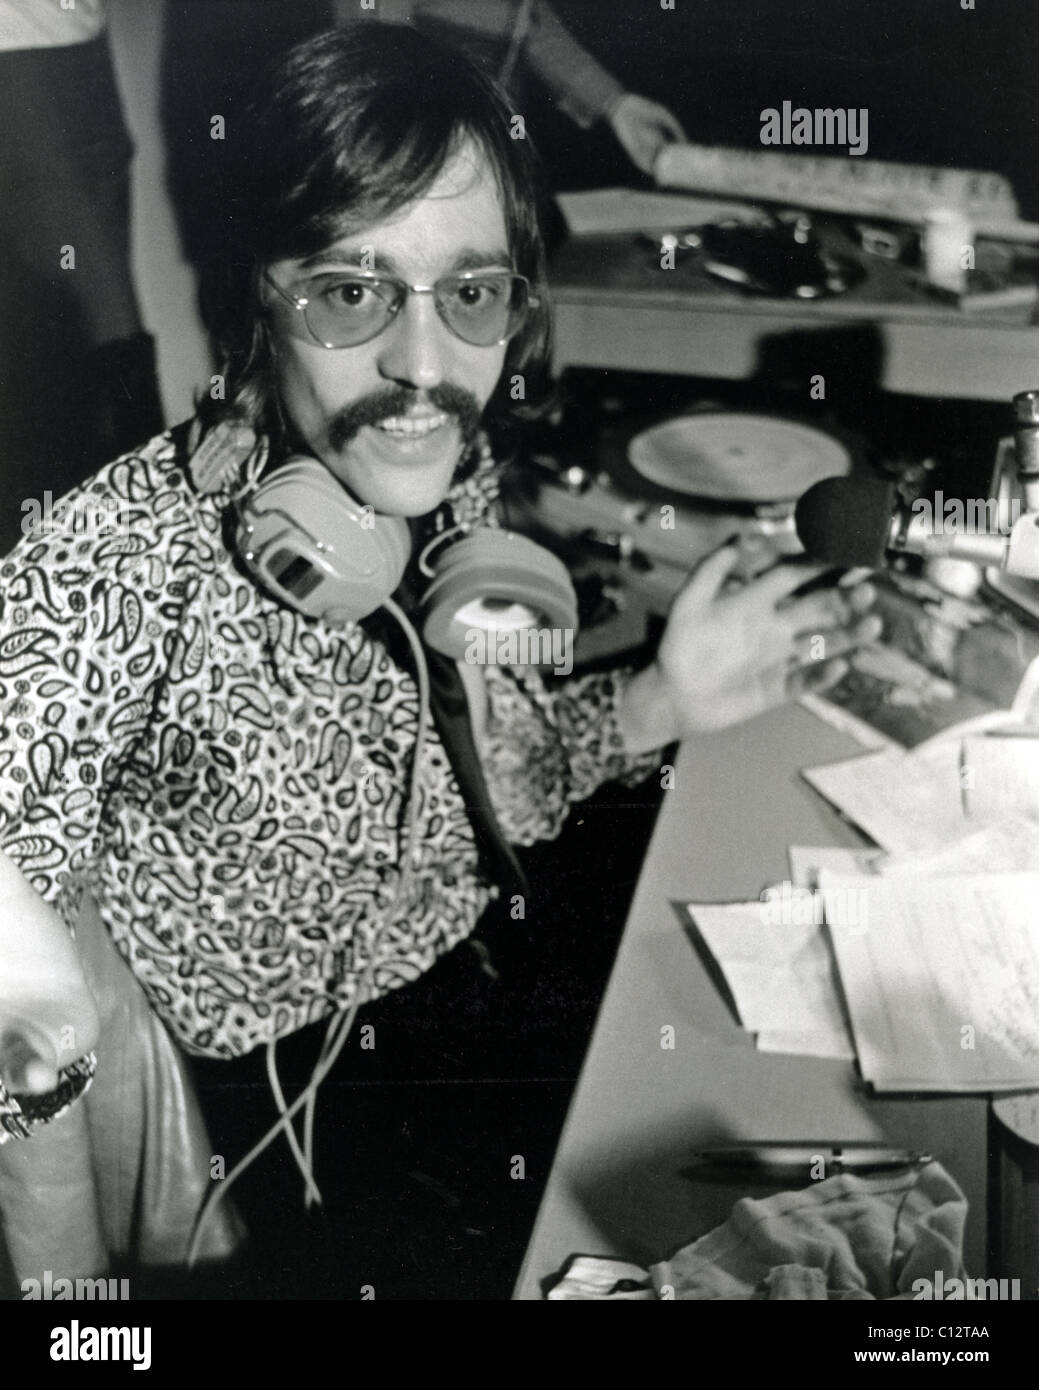 Tommy Vance 1940 2005 English Dj And Radio Presenter